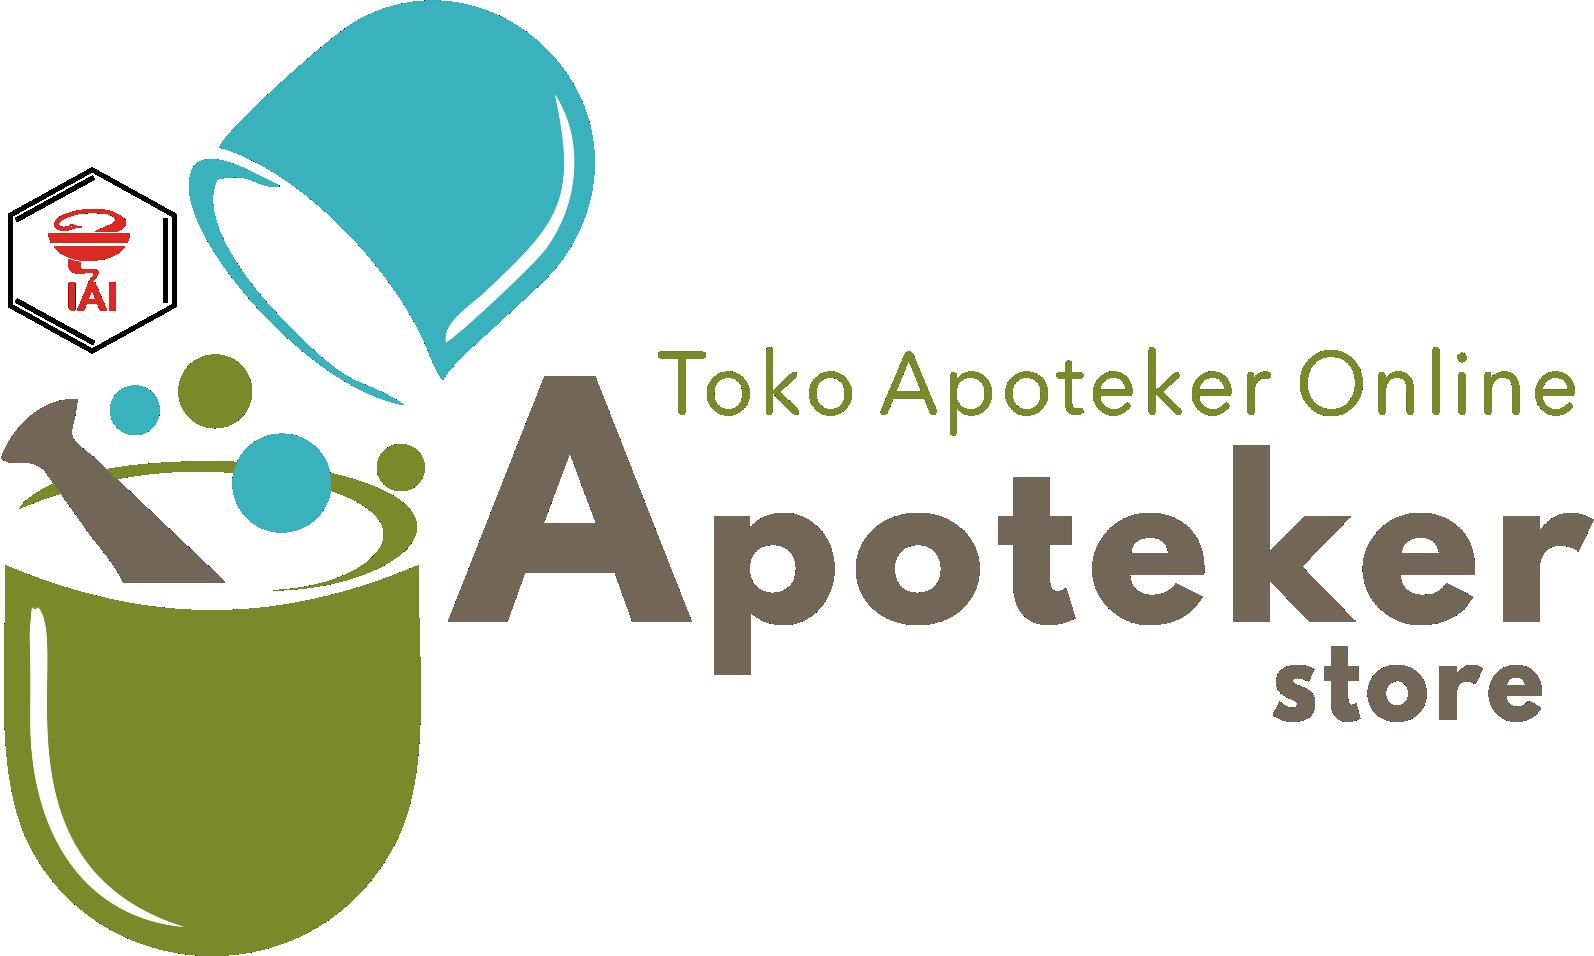 Toko Apoteker Online